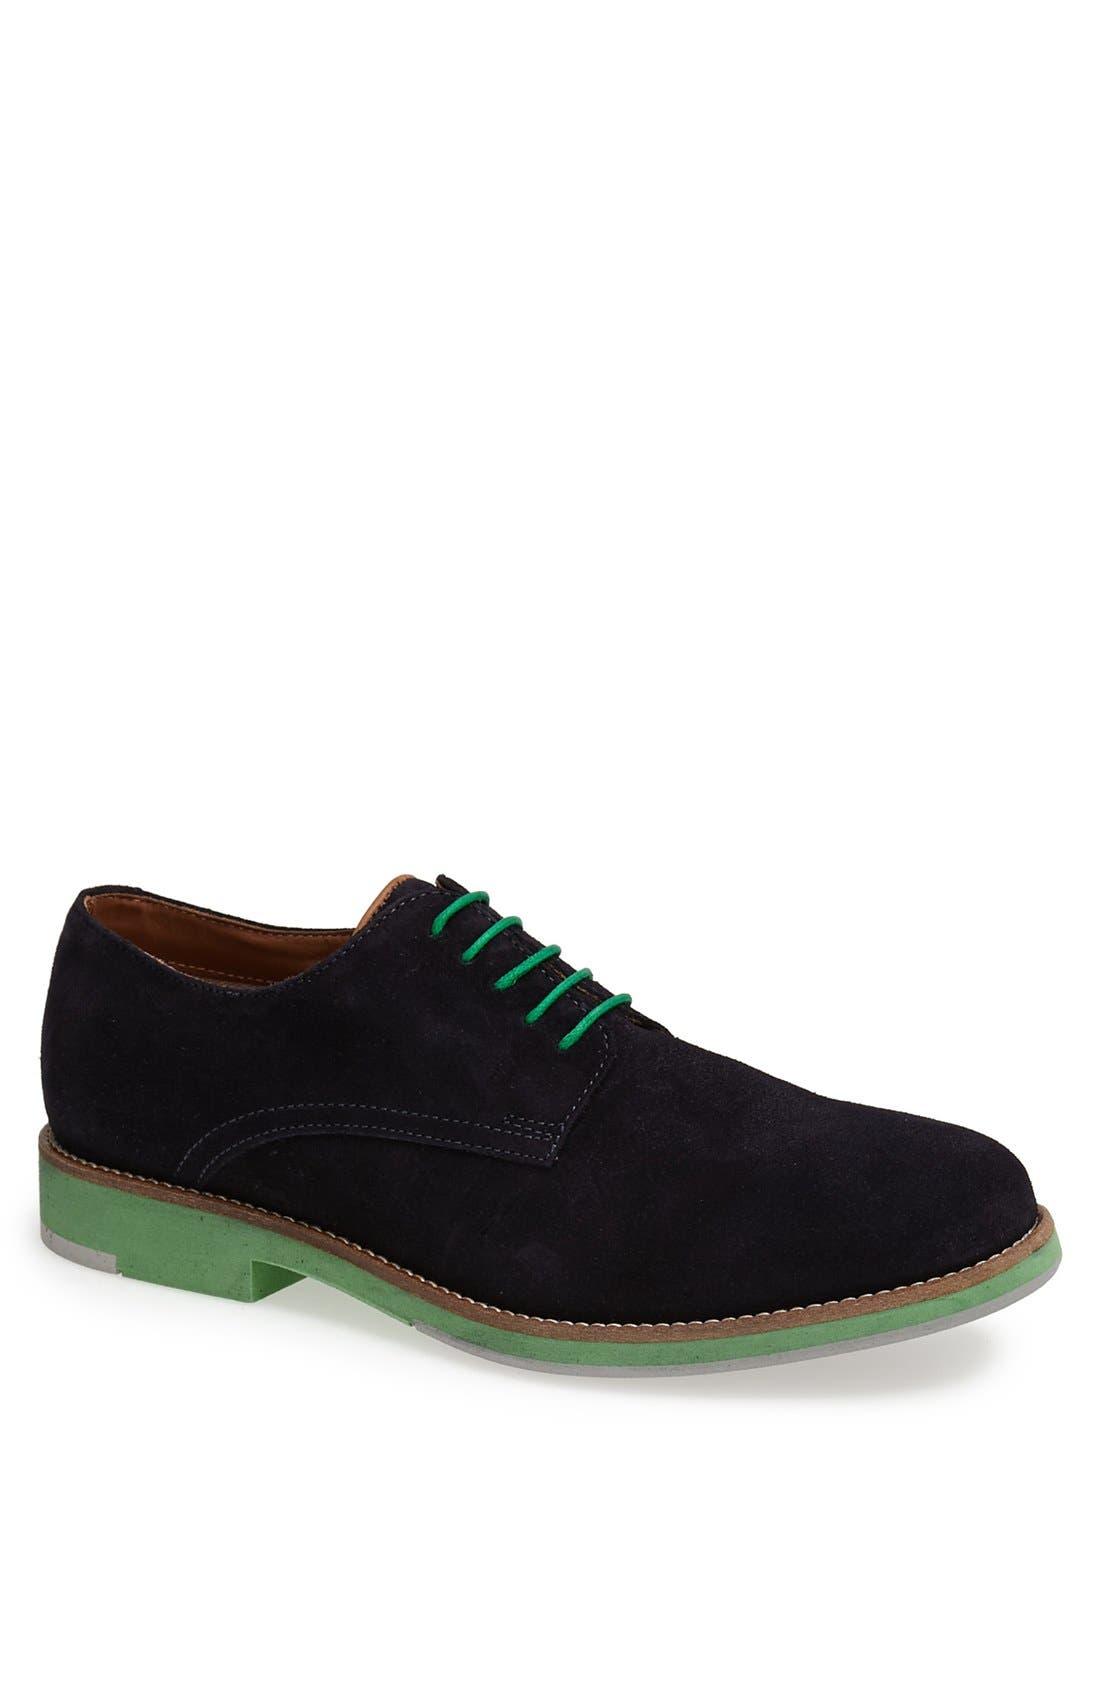 Alternate Image 1 Selected - ALDO 'Santane' Buck Shoe (Men)